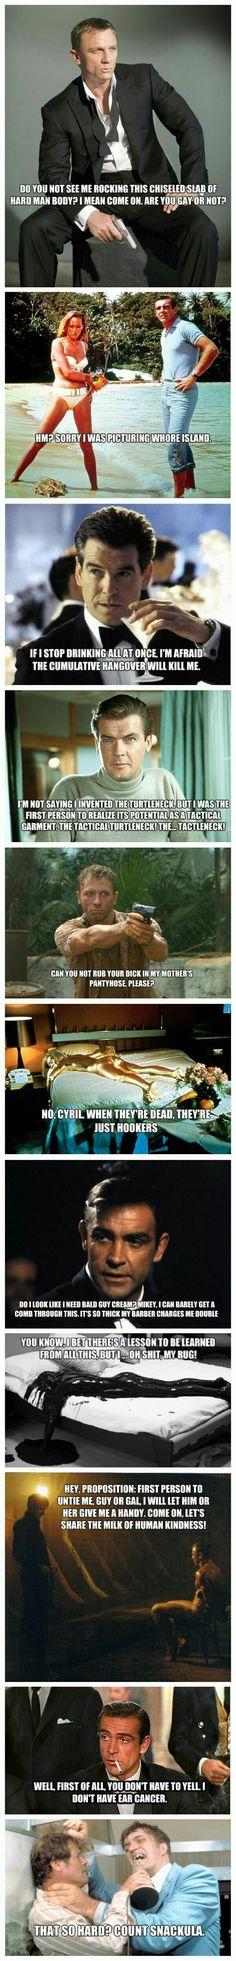 Archer quotes over James Bond stills. Lol